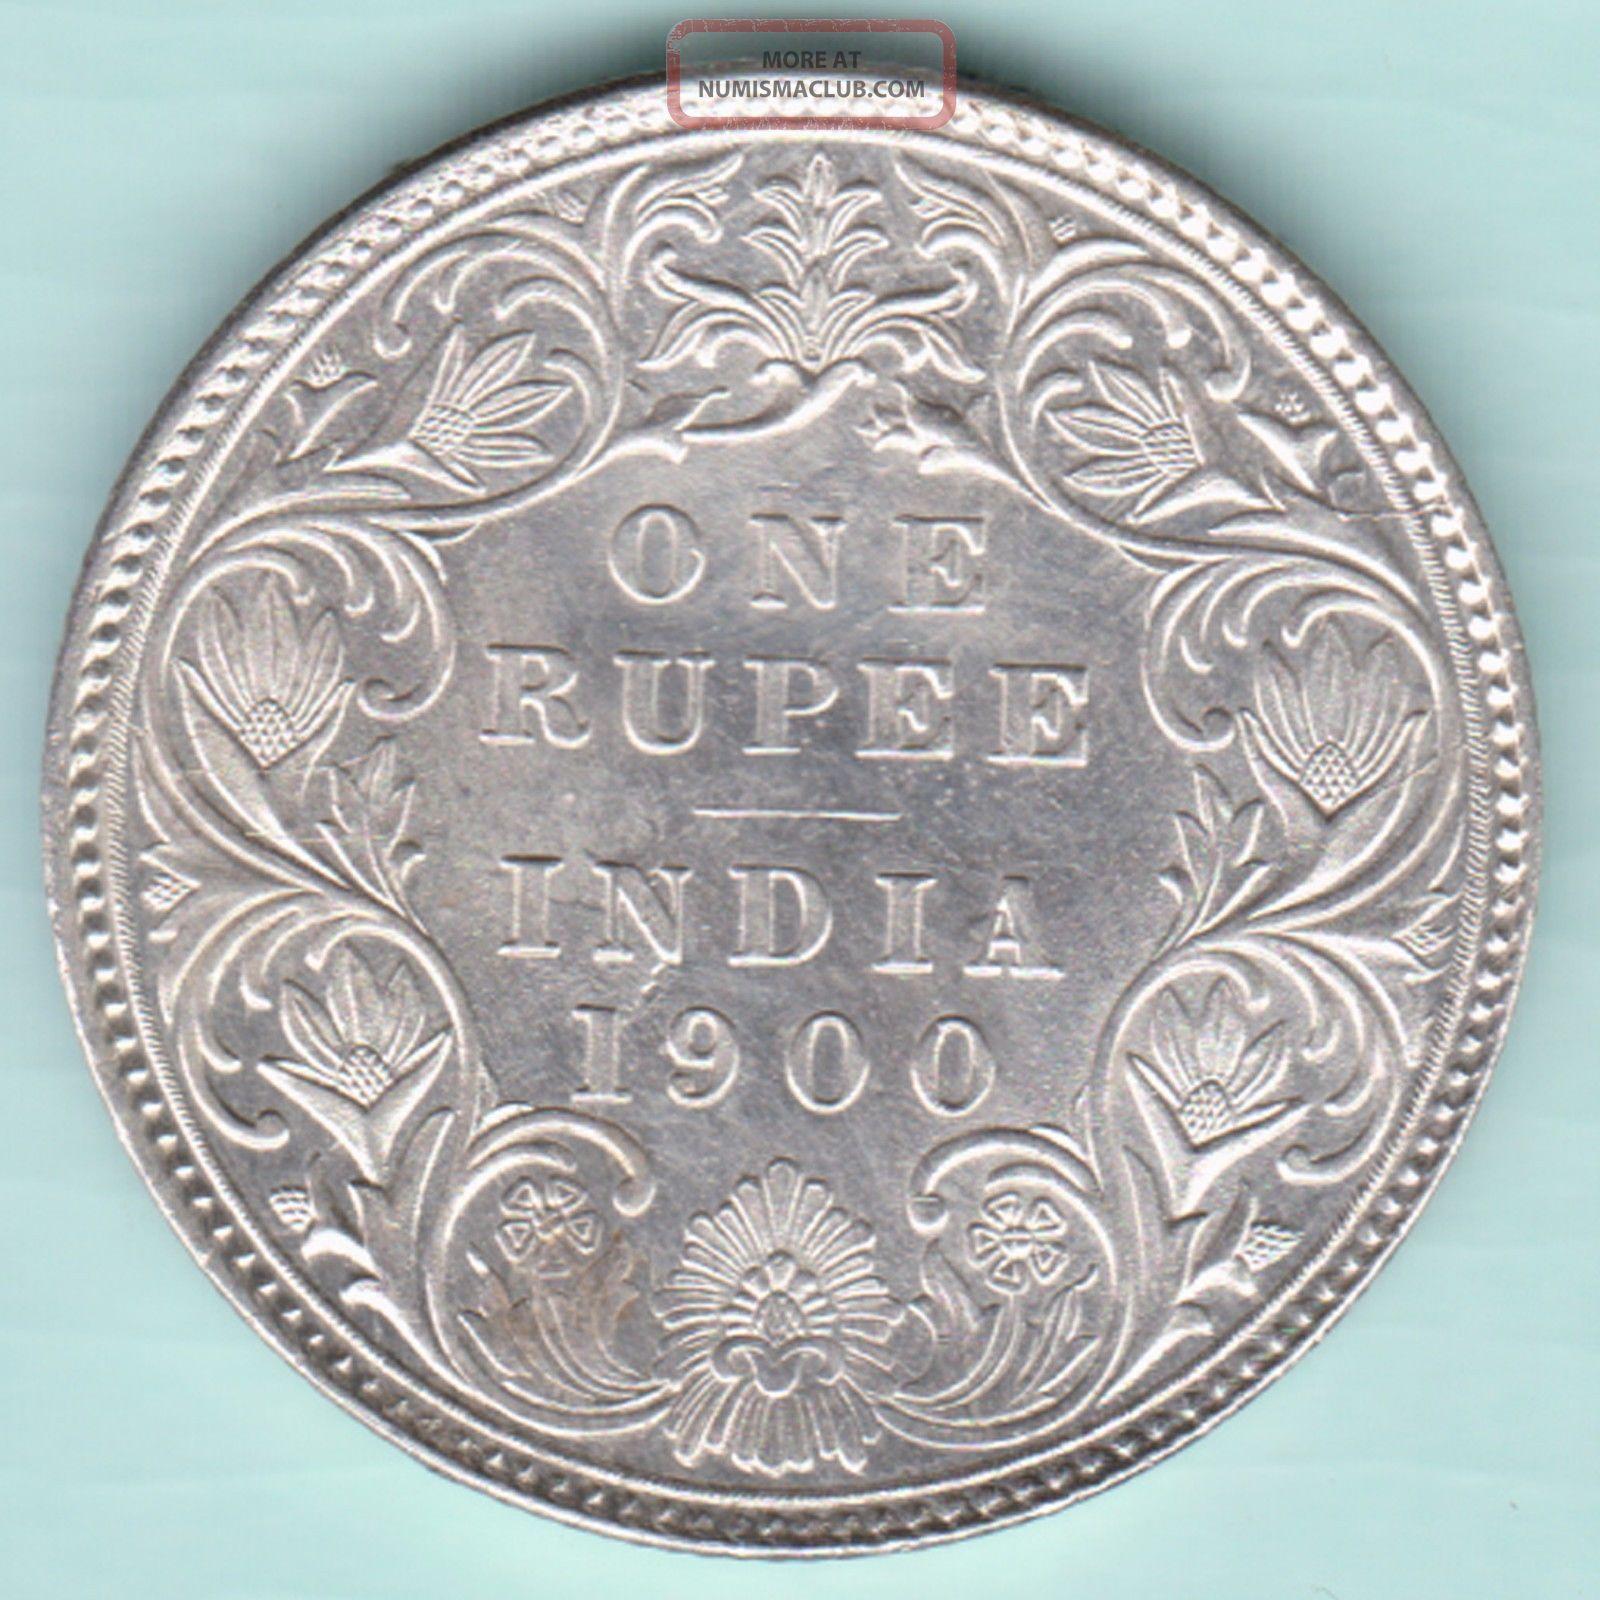 British India - 1900 - Victoria Empress - One Rupee - Rarest Silver Coin India photo